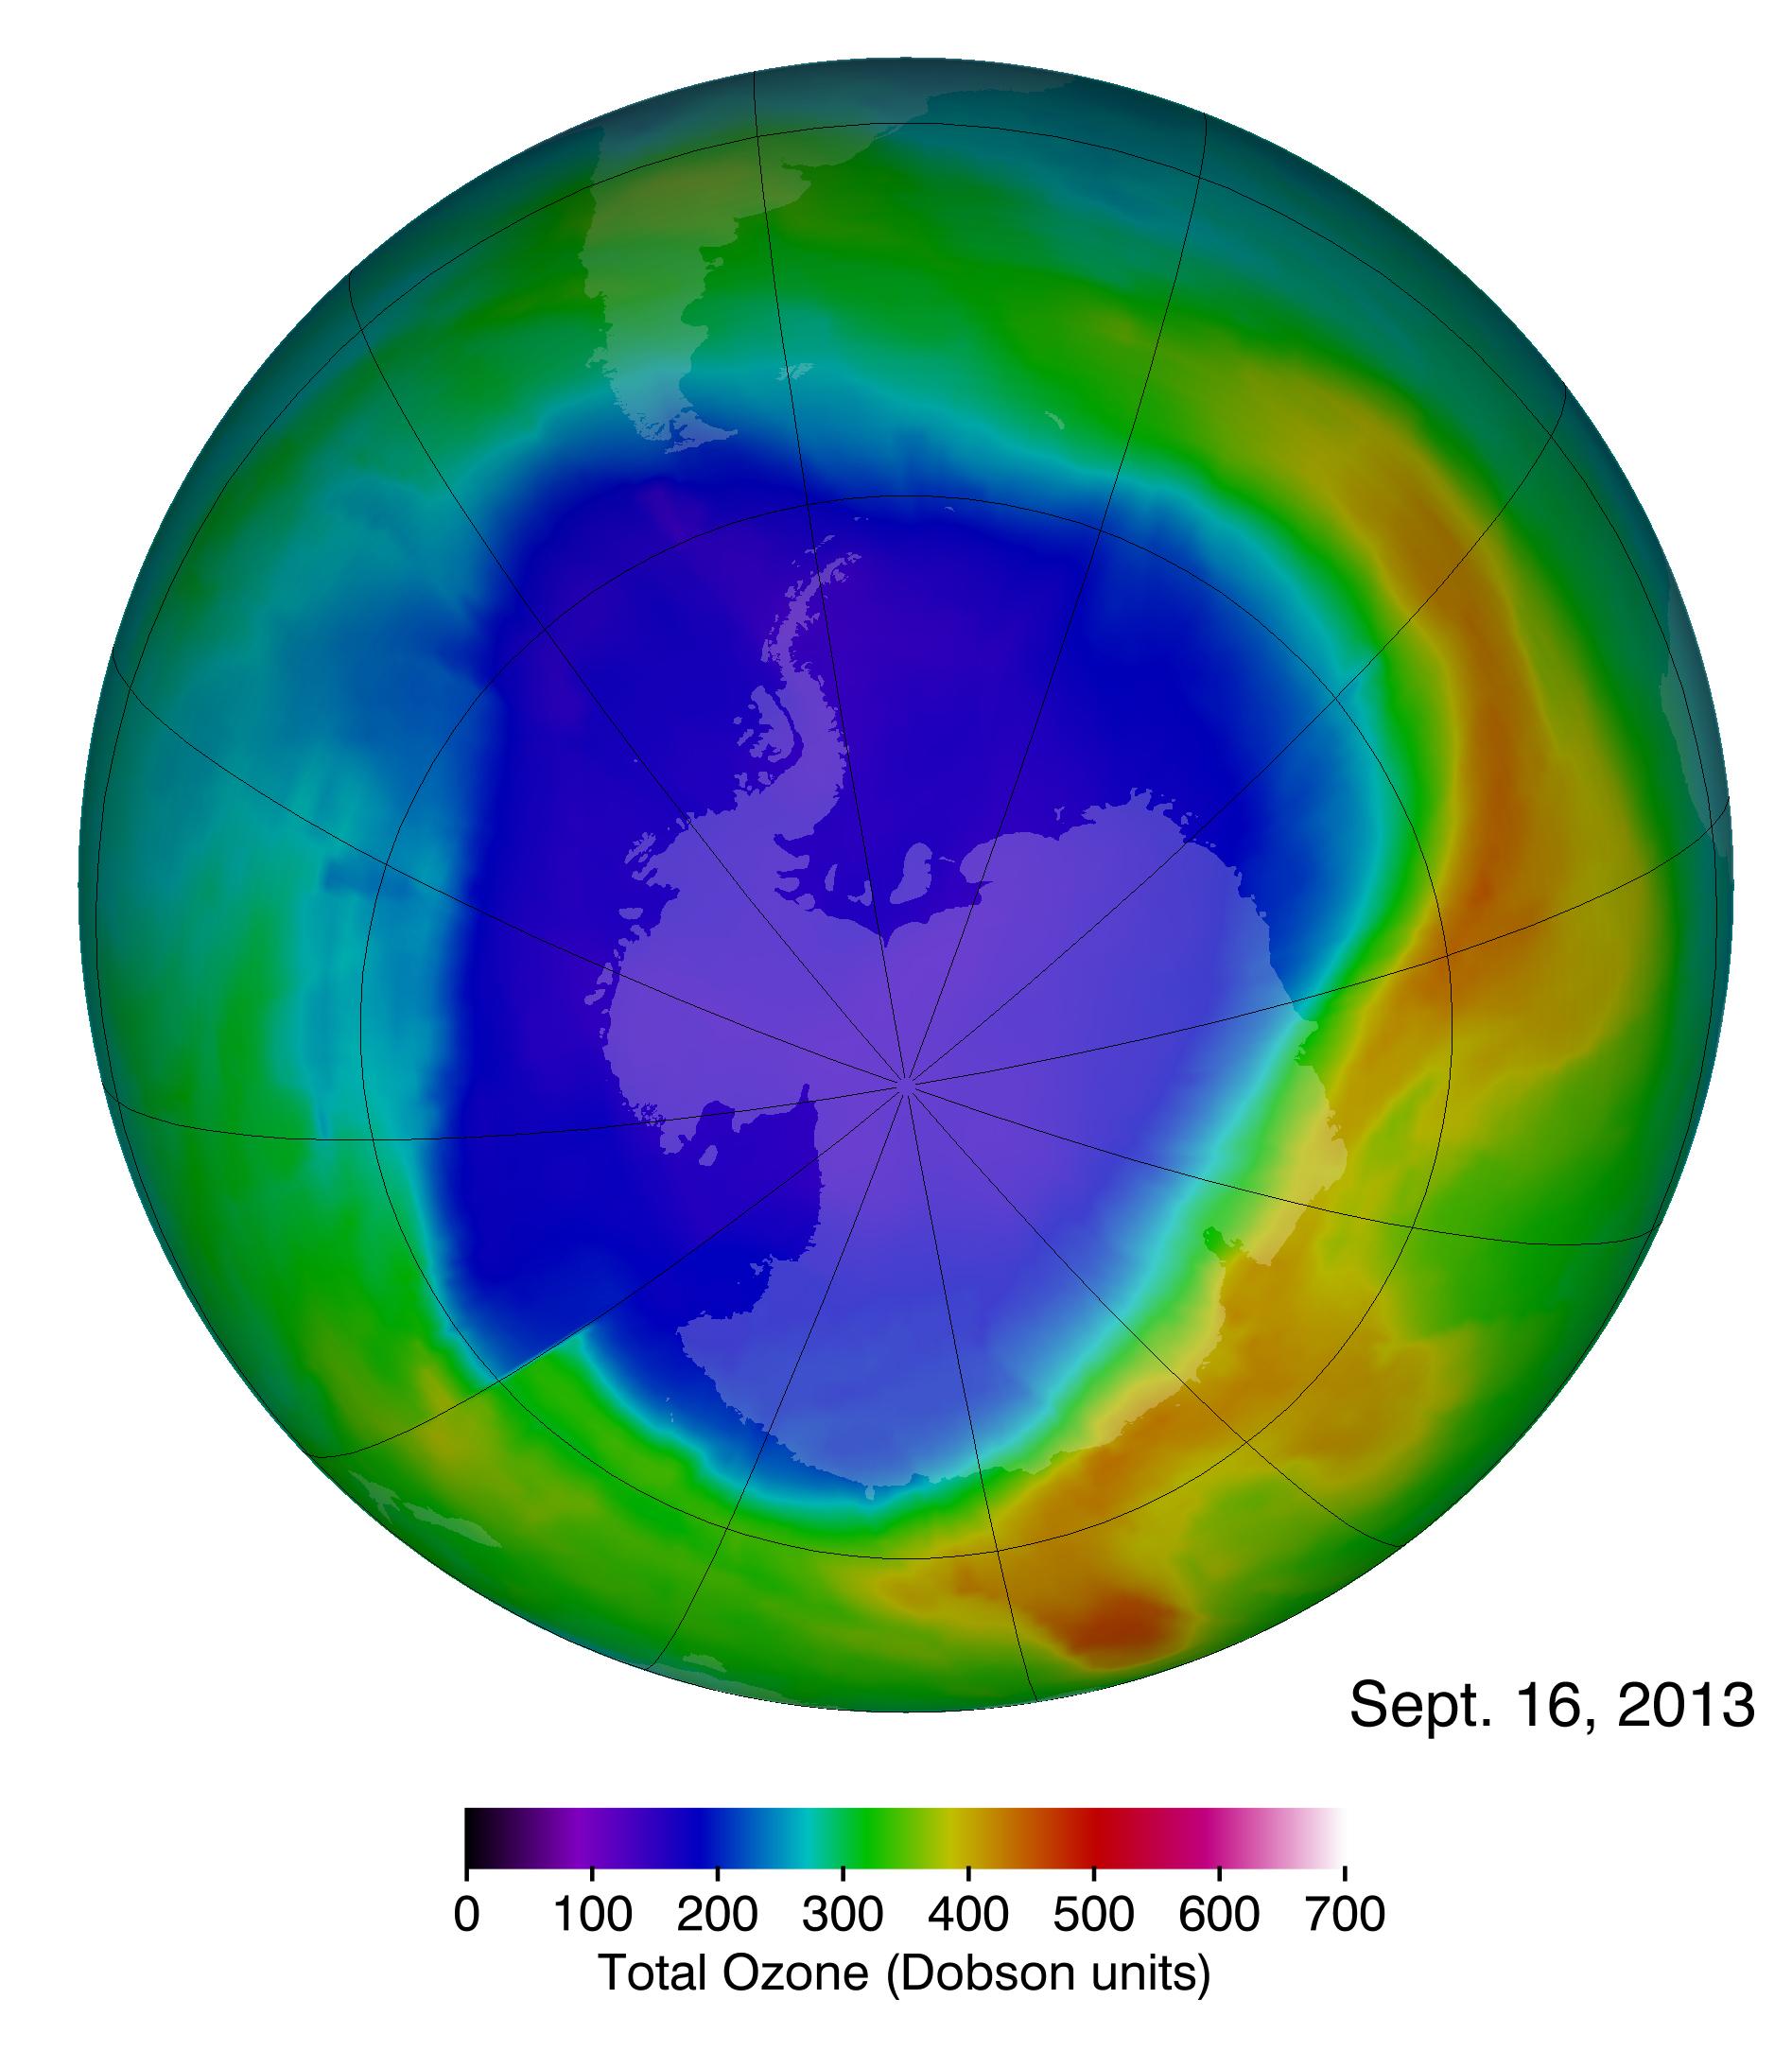 Antarctic Ozone Hole Slightly Smaller Than Average This